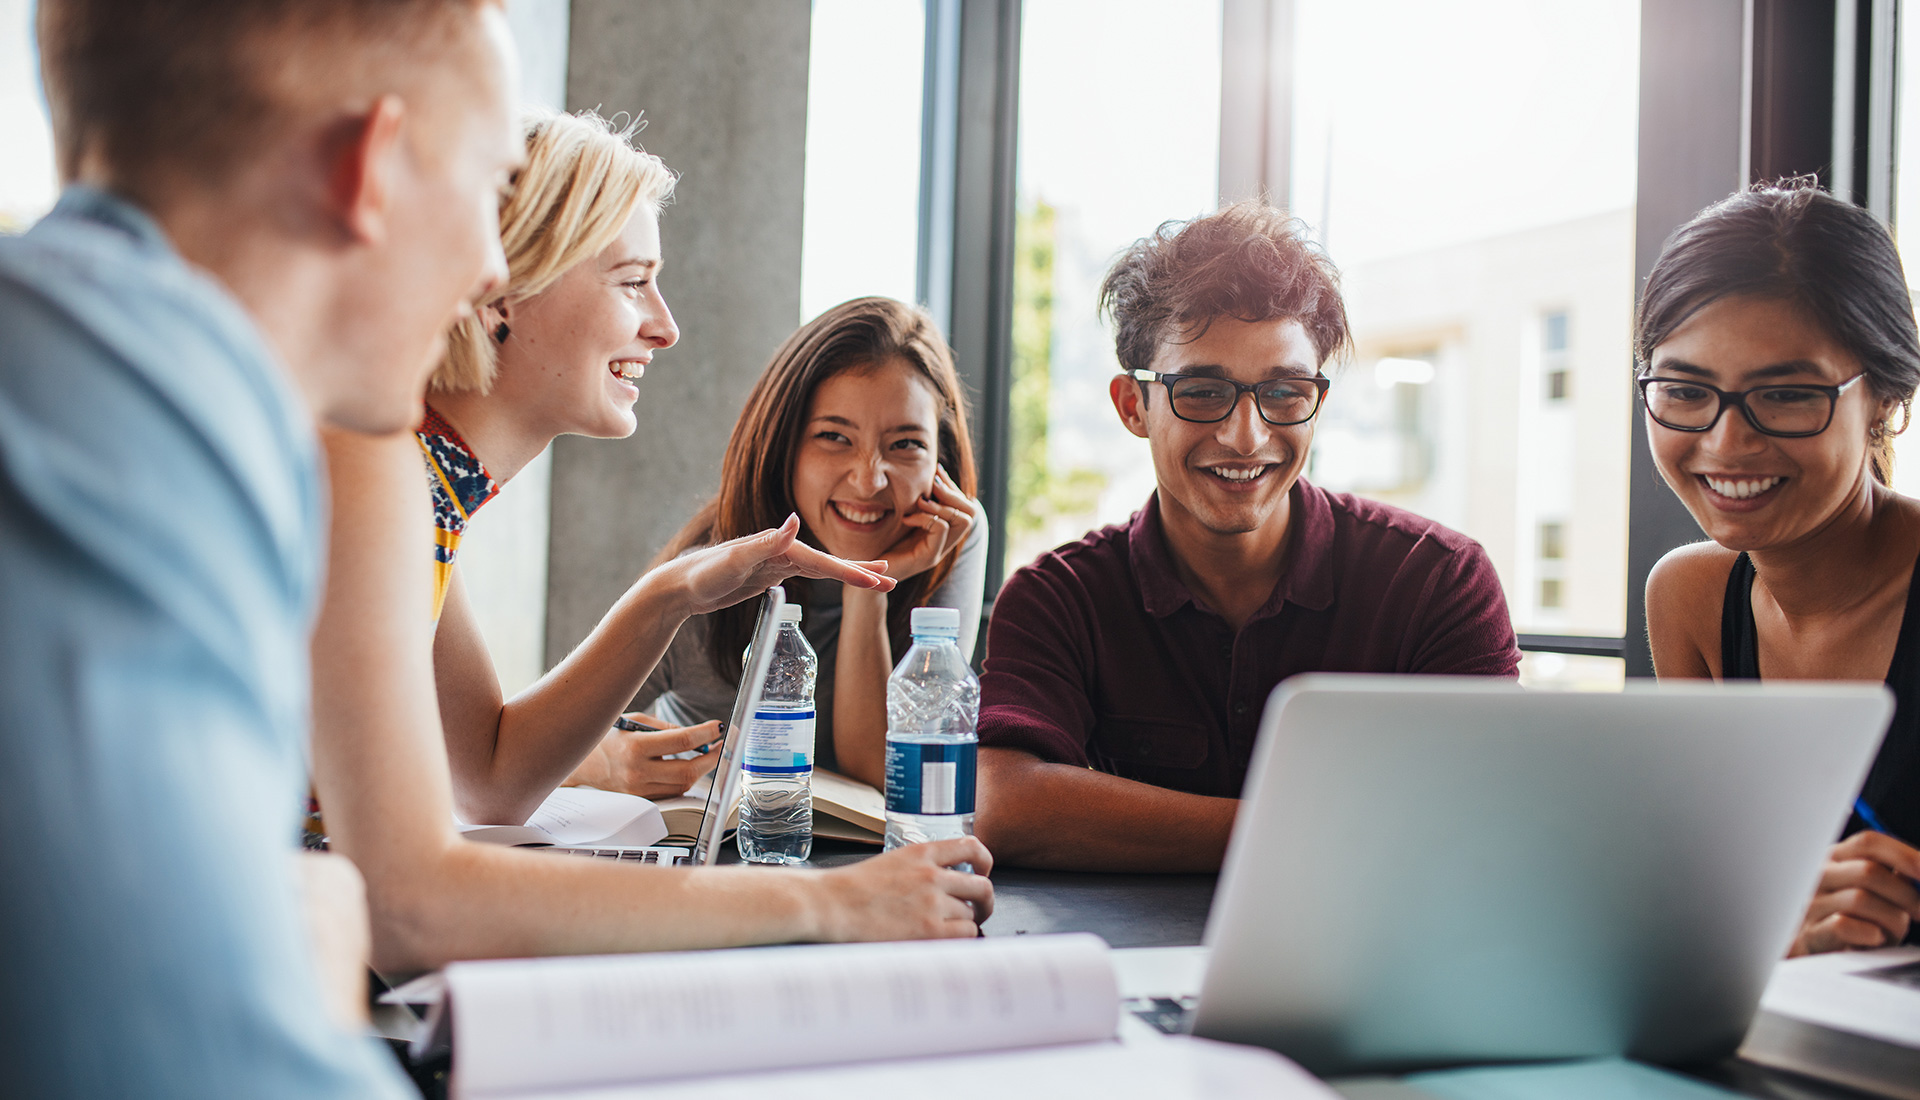 E-Learning, Lernplattformen und digitales Lernen